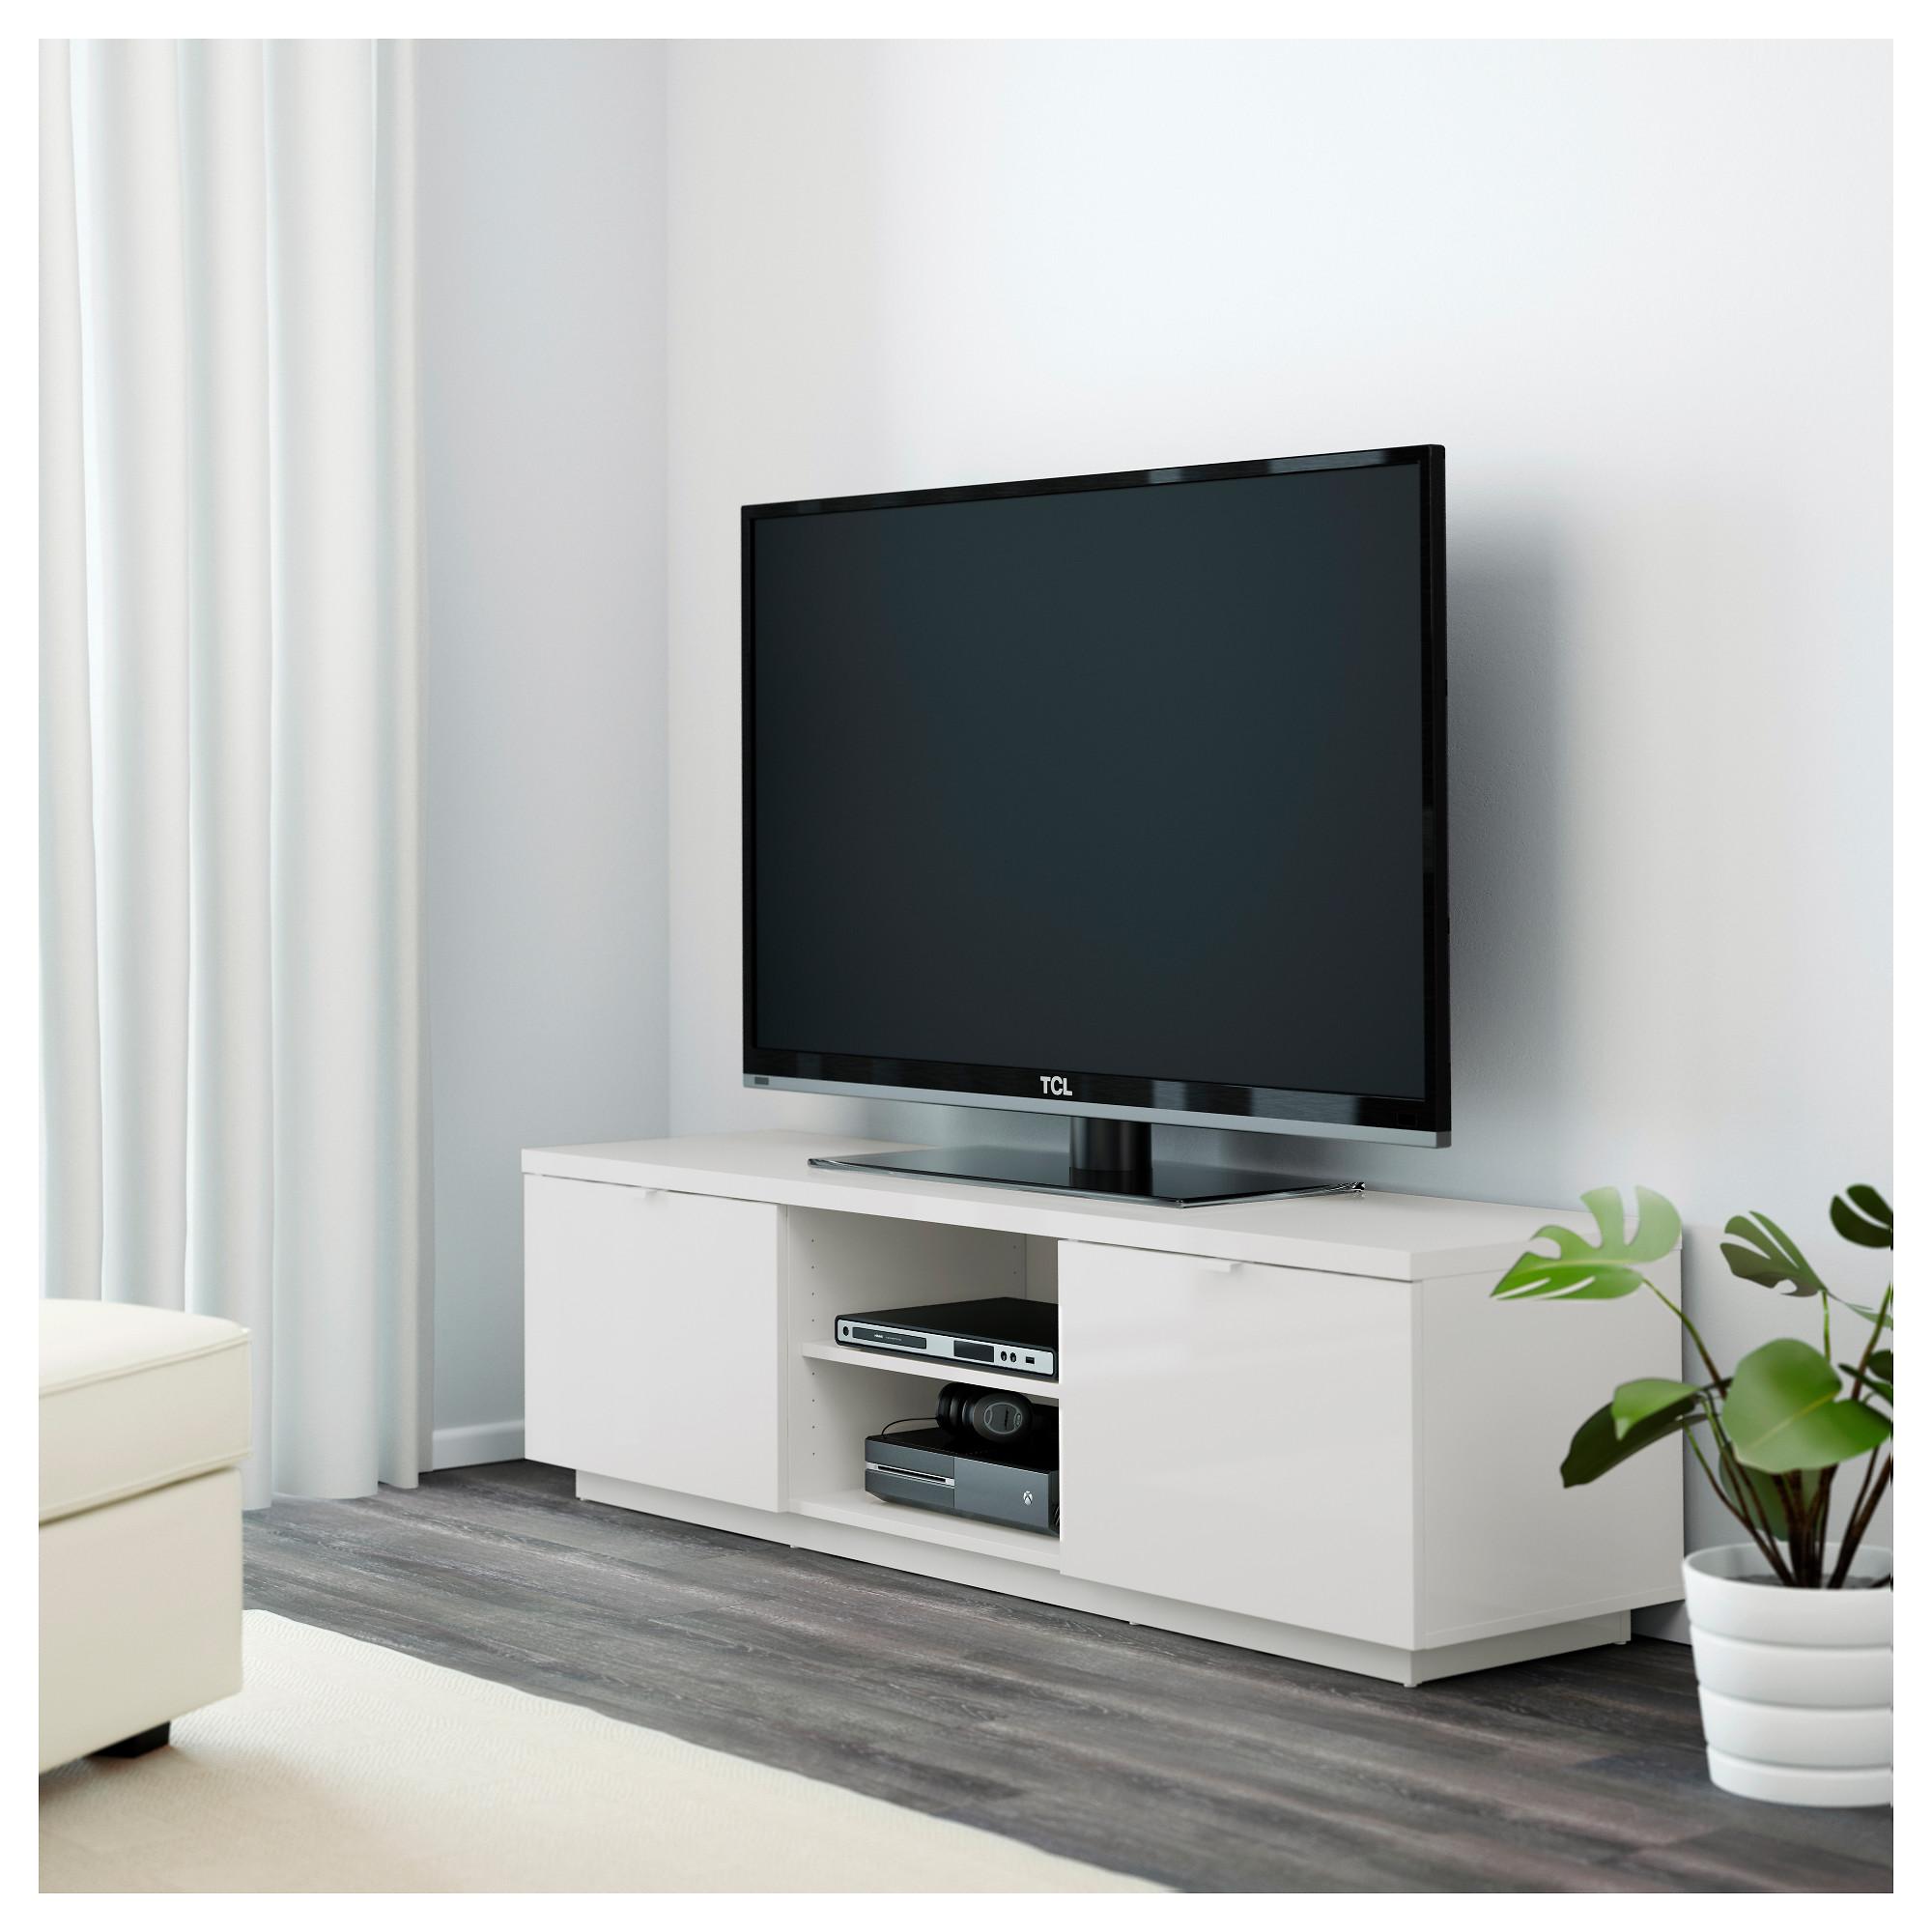 Porta Tv Ikea.Byas Tv Bench High Gloss White Ikea Hong Kong